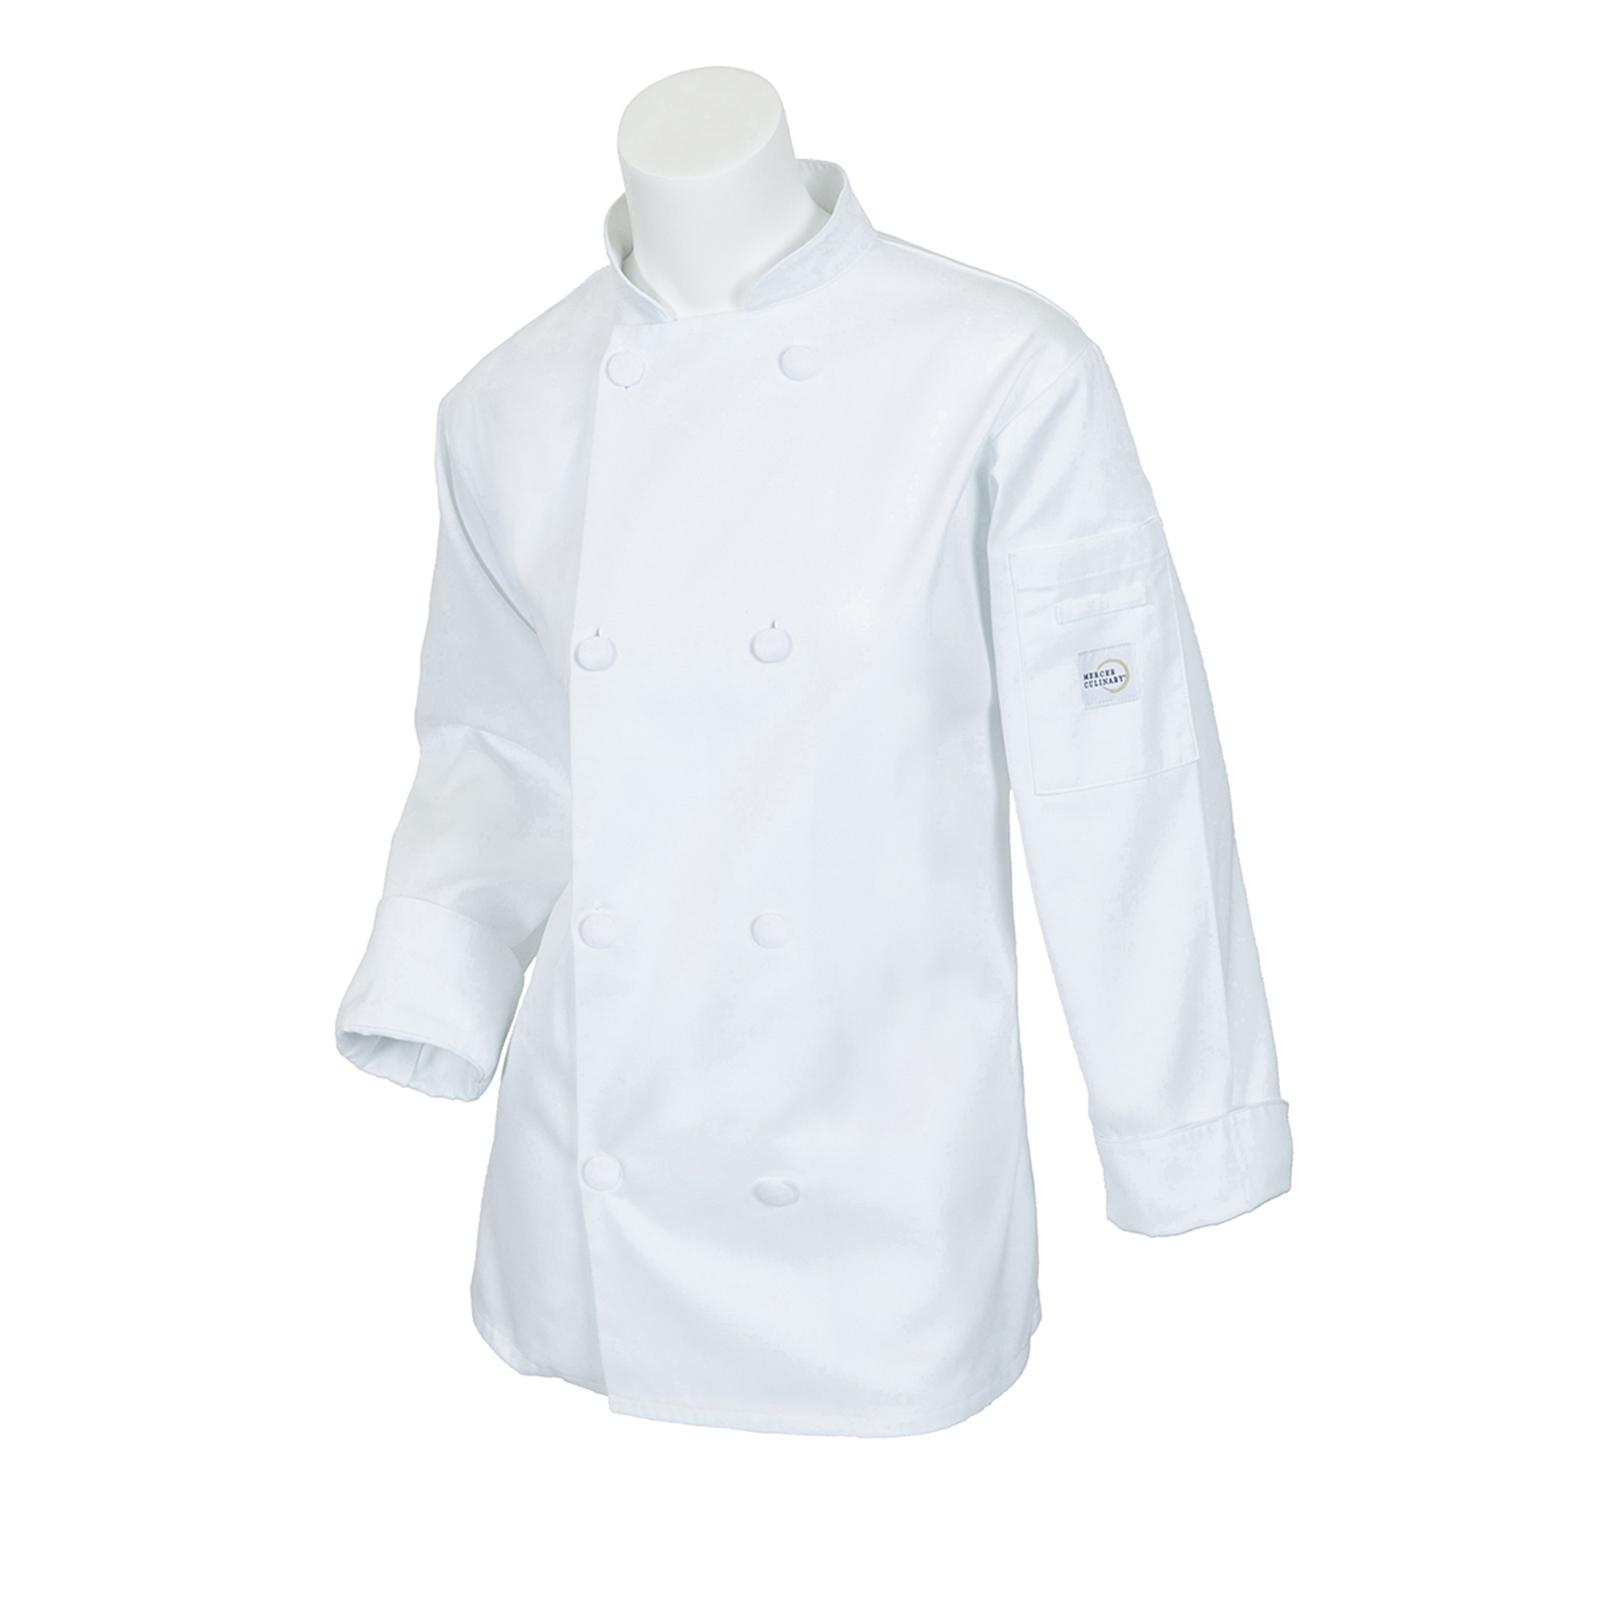 Mercer Culinary M60022WHM chef's coat